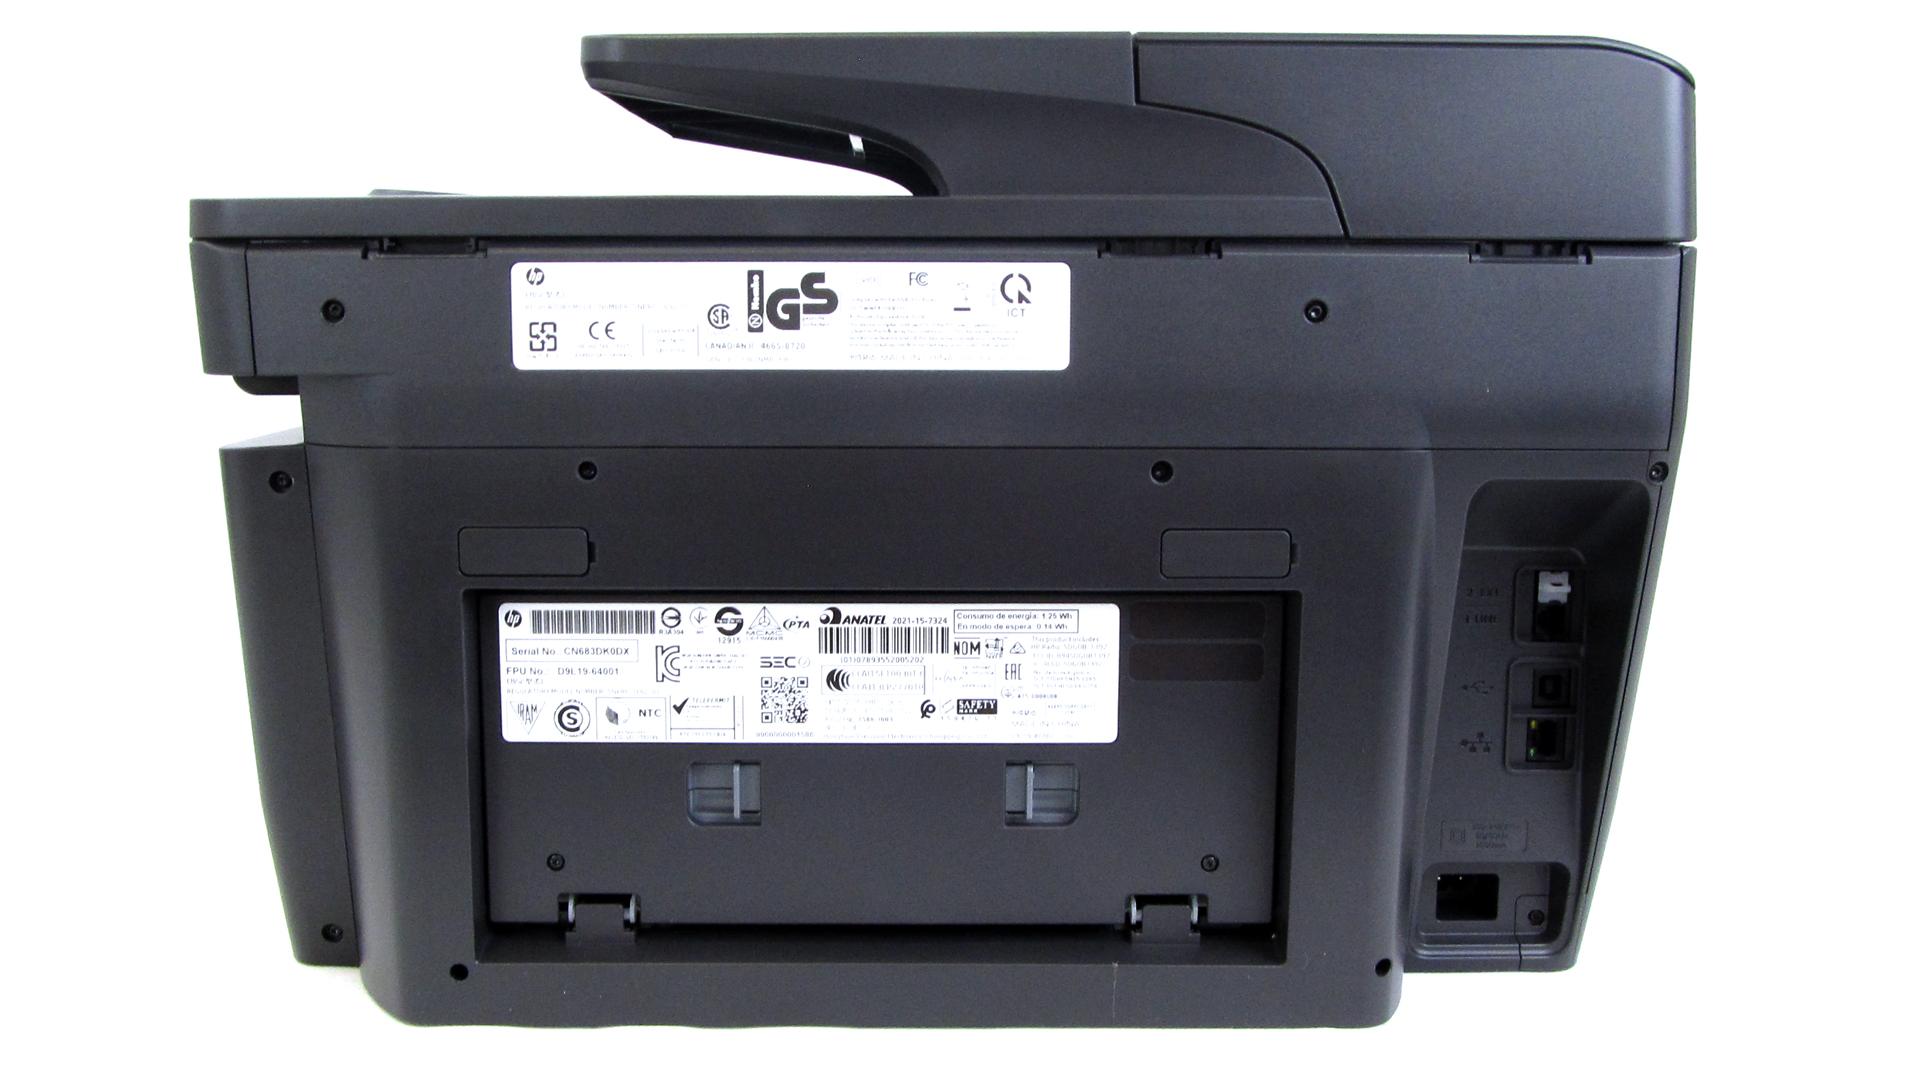 hp officejet multifunktionsdrucker bilderrahmen ideen. Black Bedroom Furniture Sets. Home Design Ideas